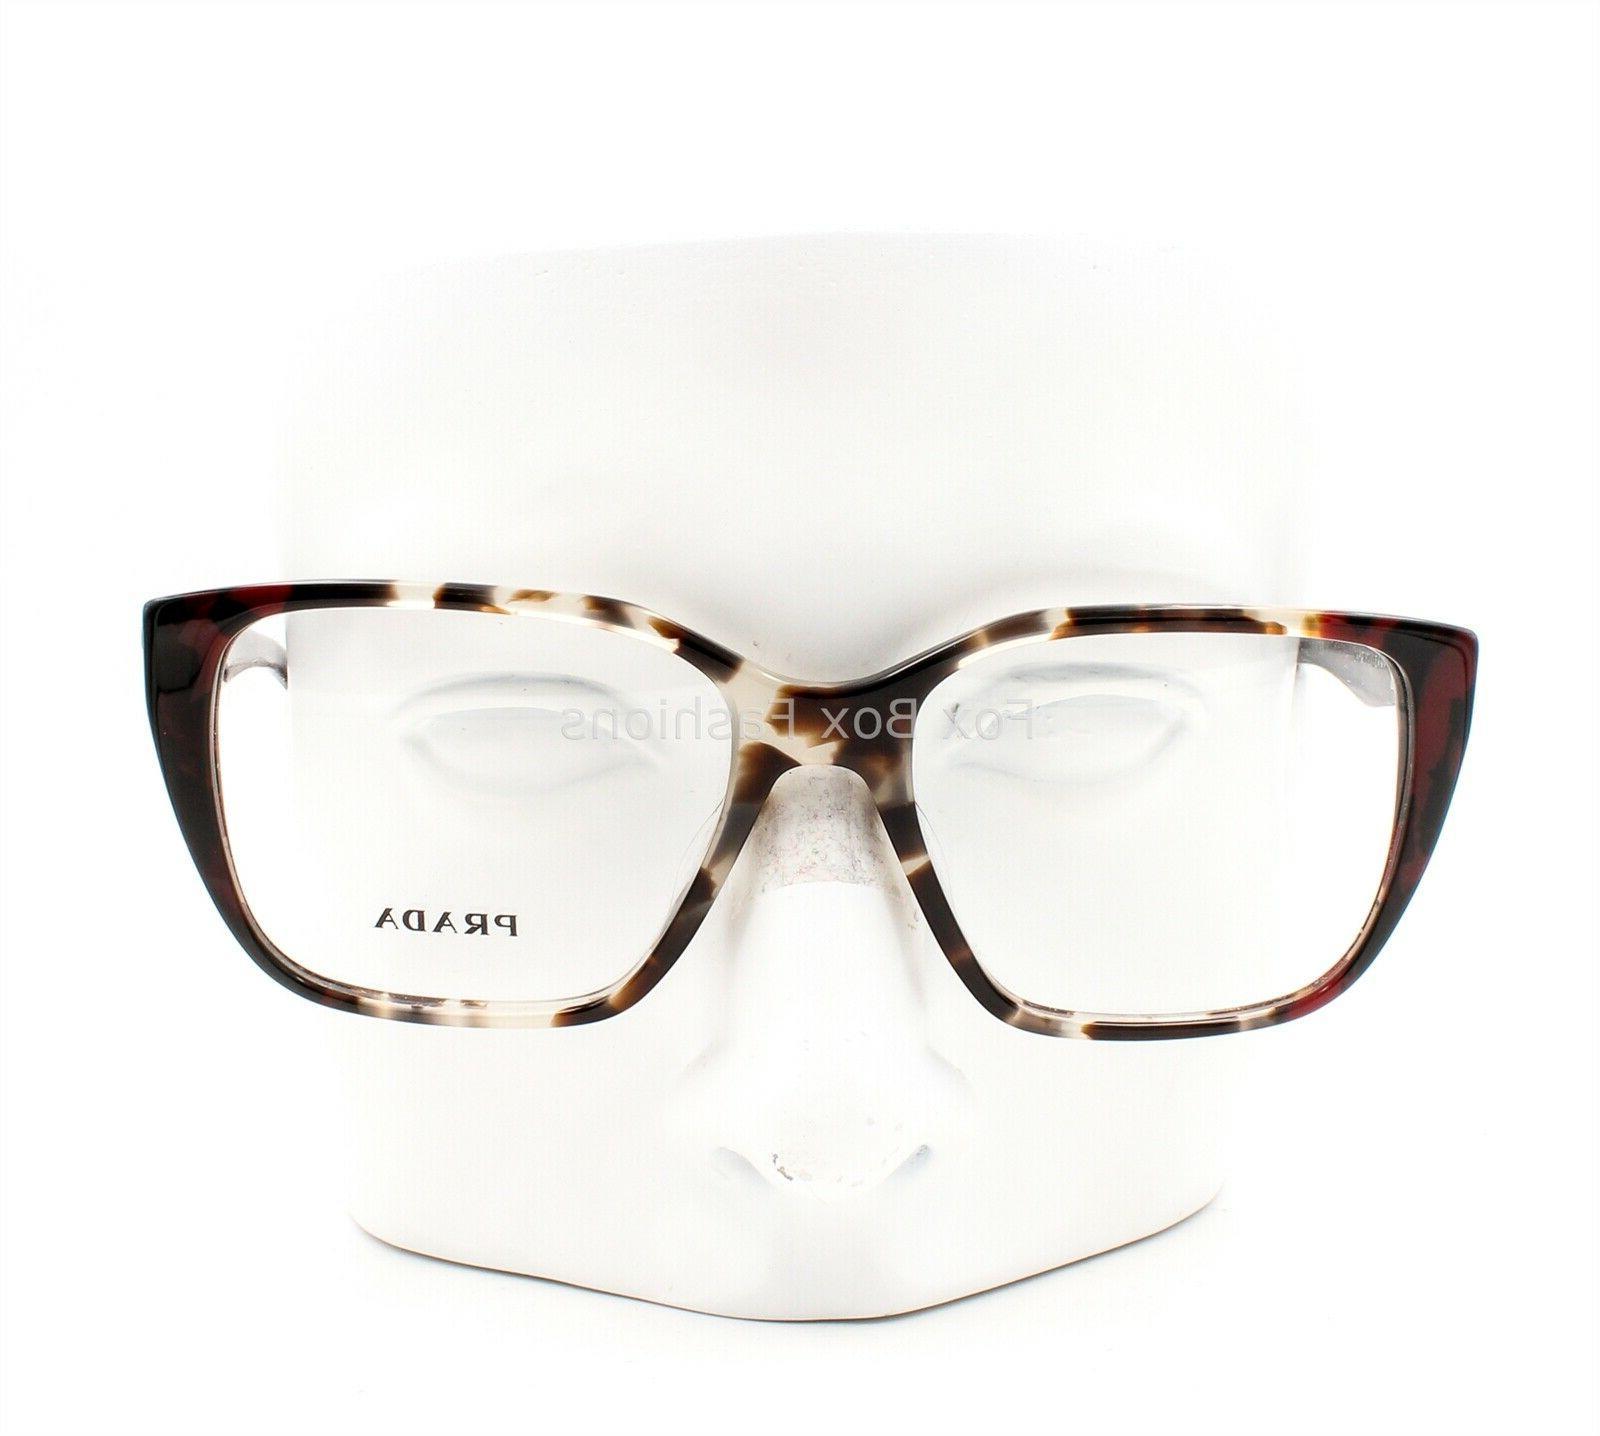 Prada Journal VPR 08T U6K-1O1 Eyeglasses Glasses Opal Brown